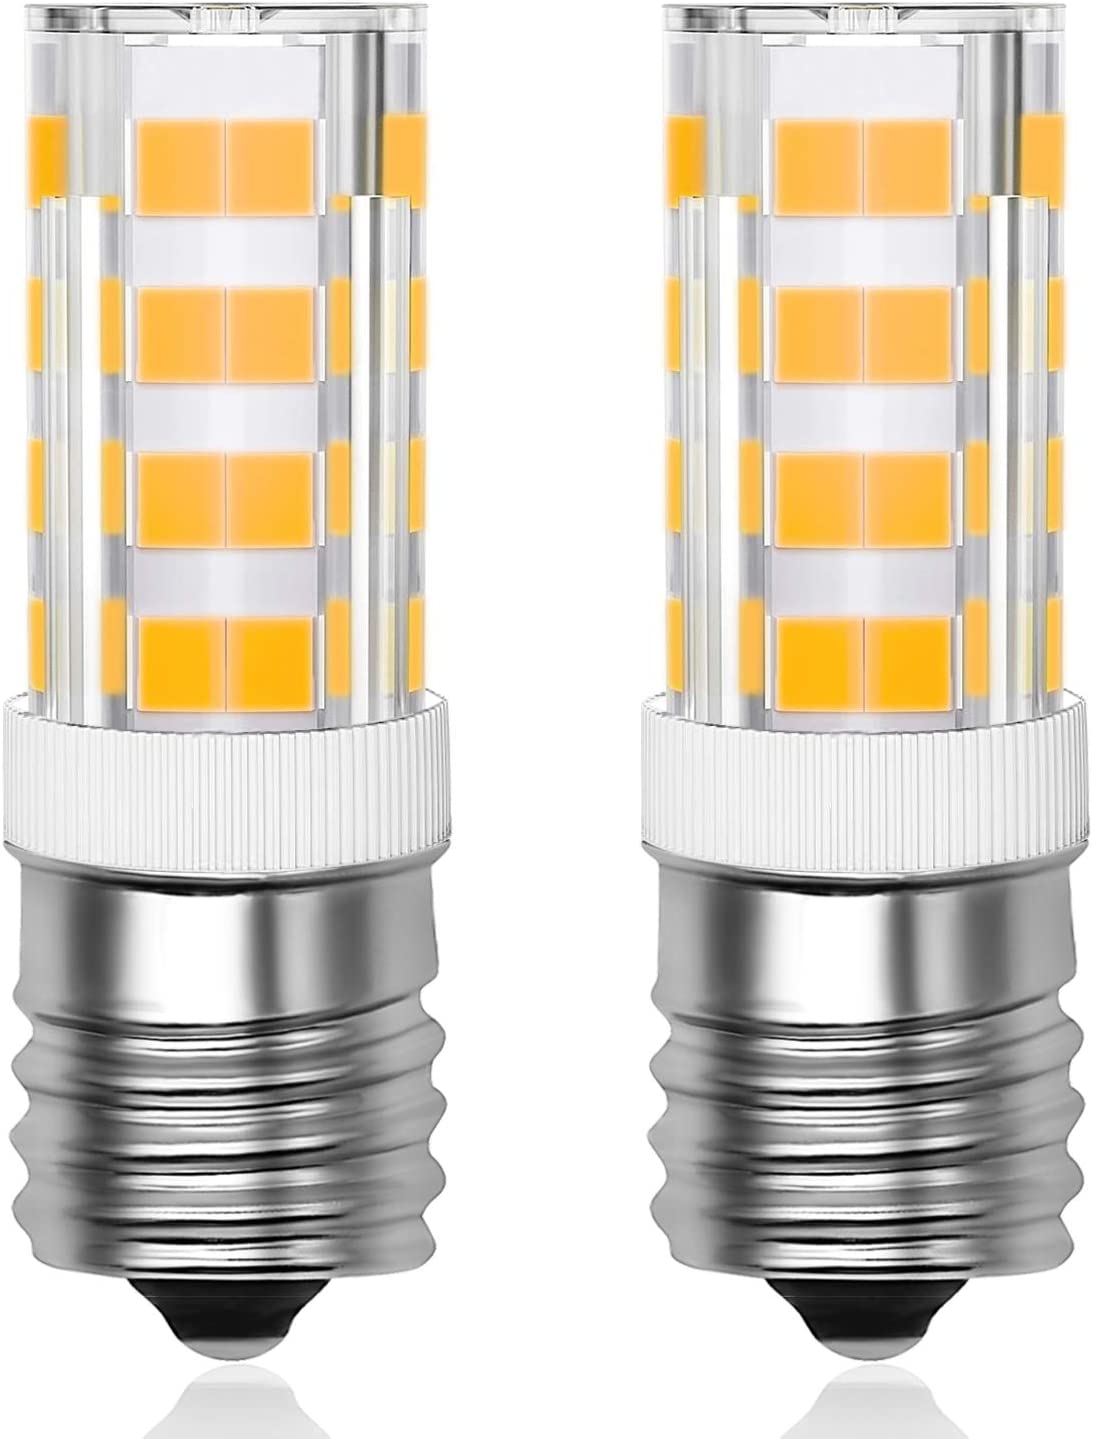 Primeswift E17 LED Bulb Microwave Oven Light Stove Bulb Light 4W Warm White Non-dimmable 3000K AC110-130V,2 Pack